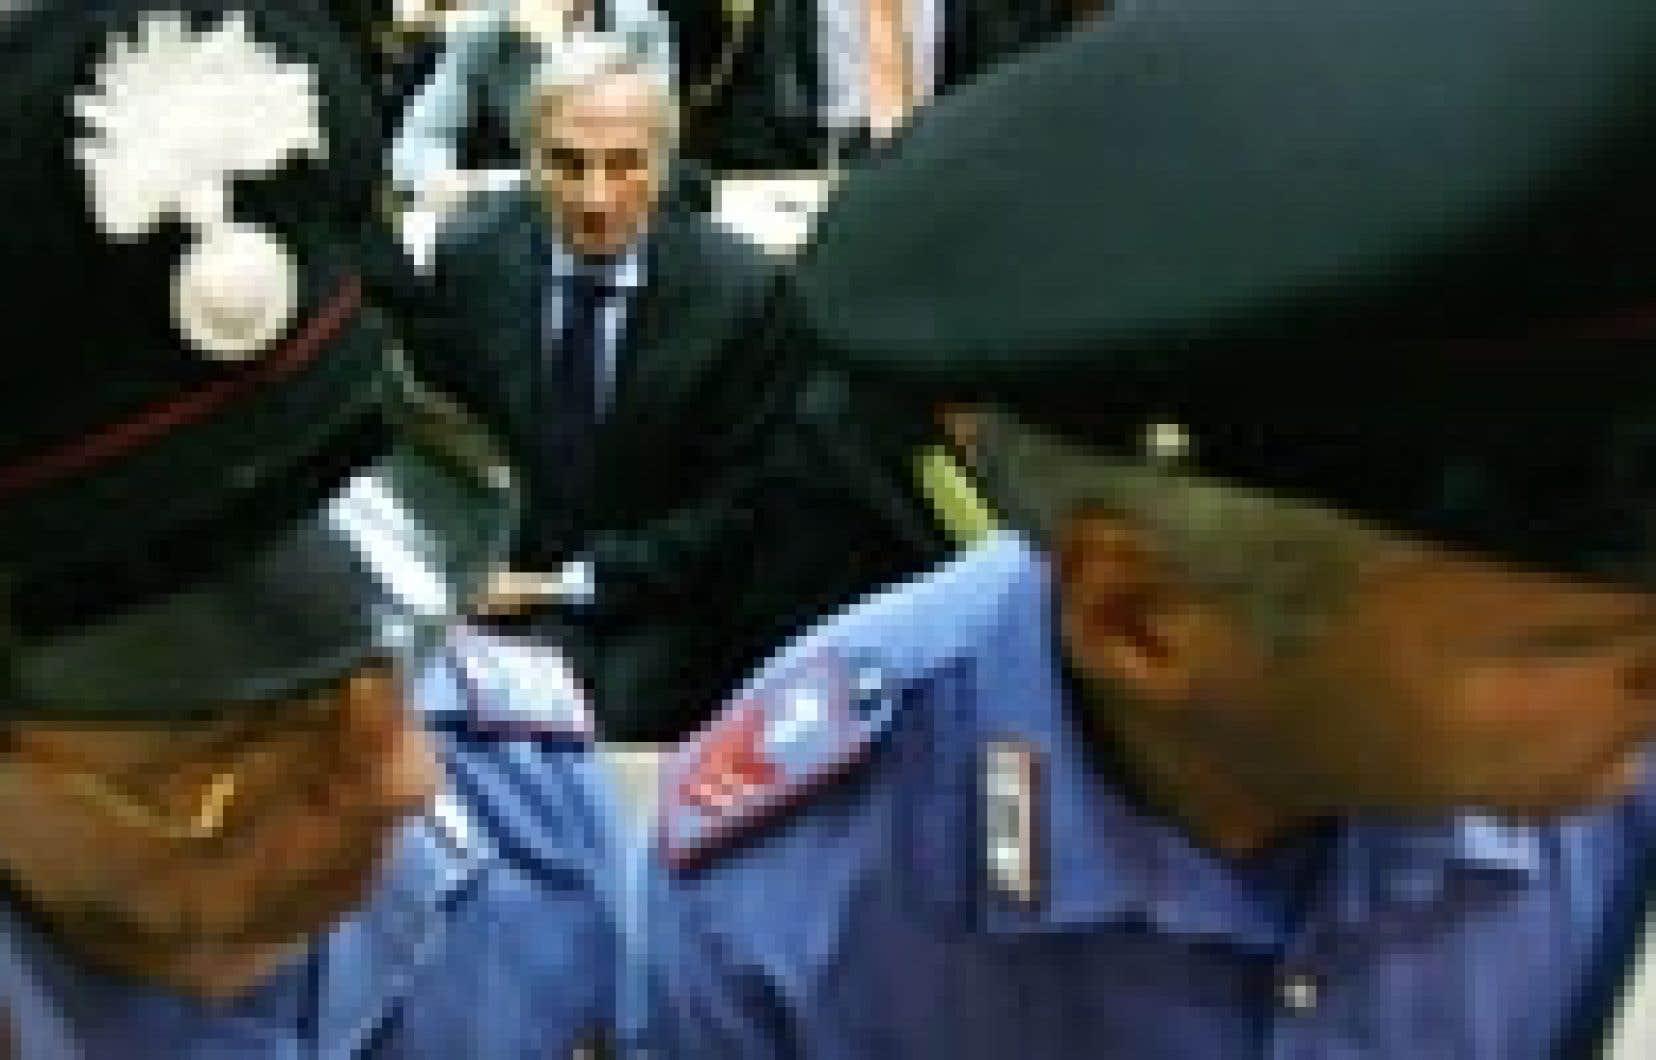 Le fondateur de Parmalat, Calisto Tanzi, au tribunal.